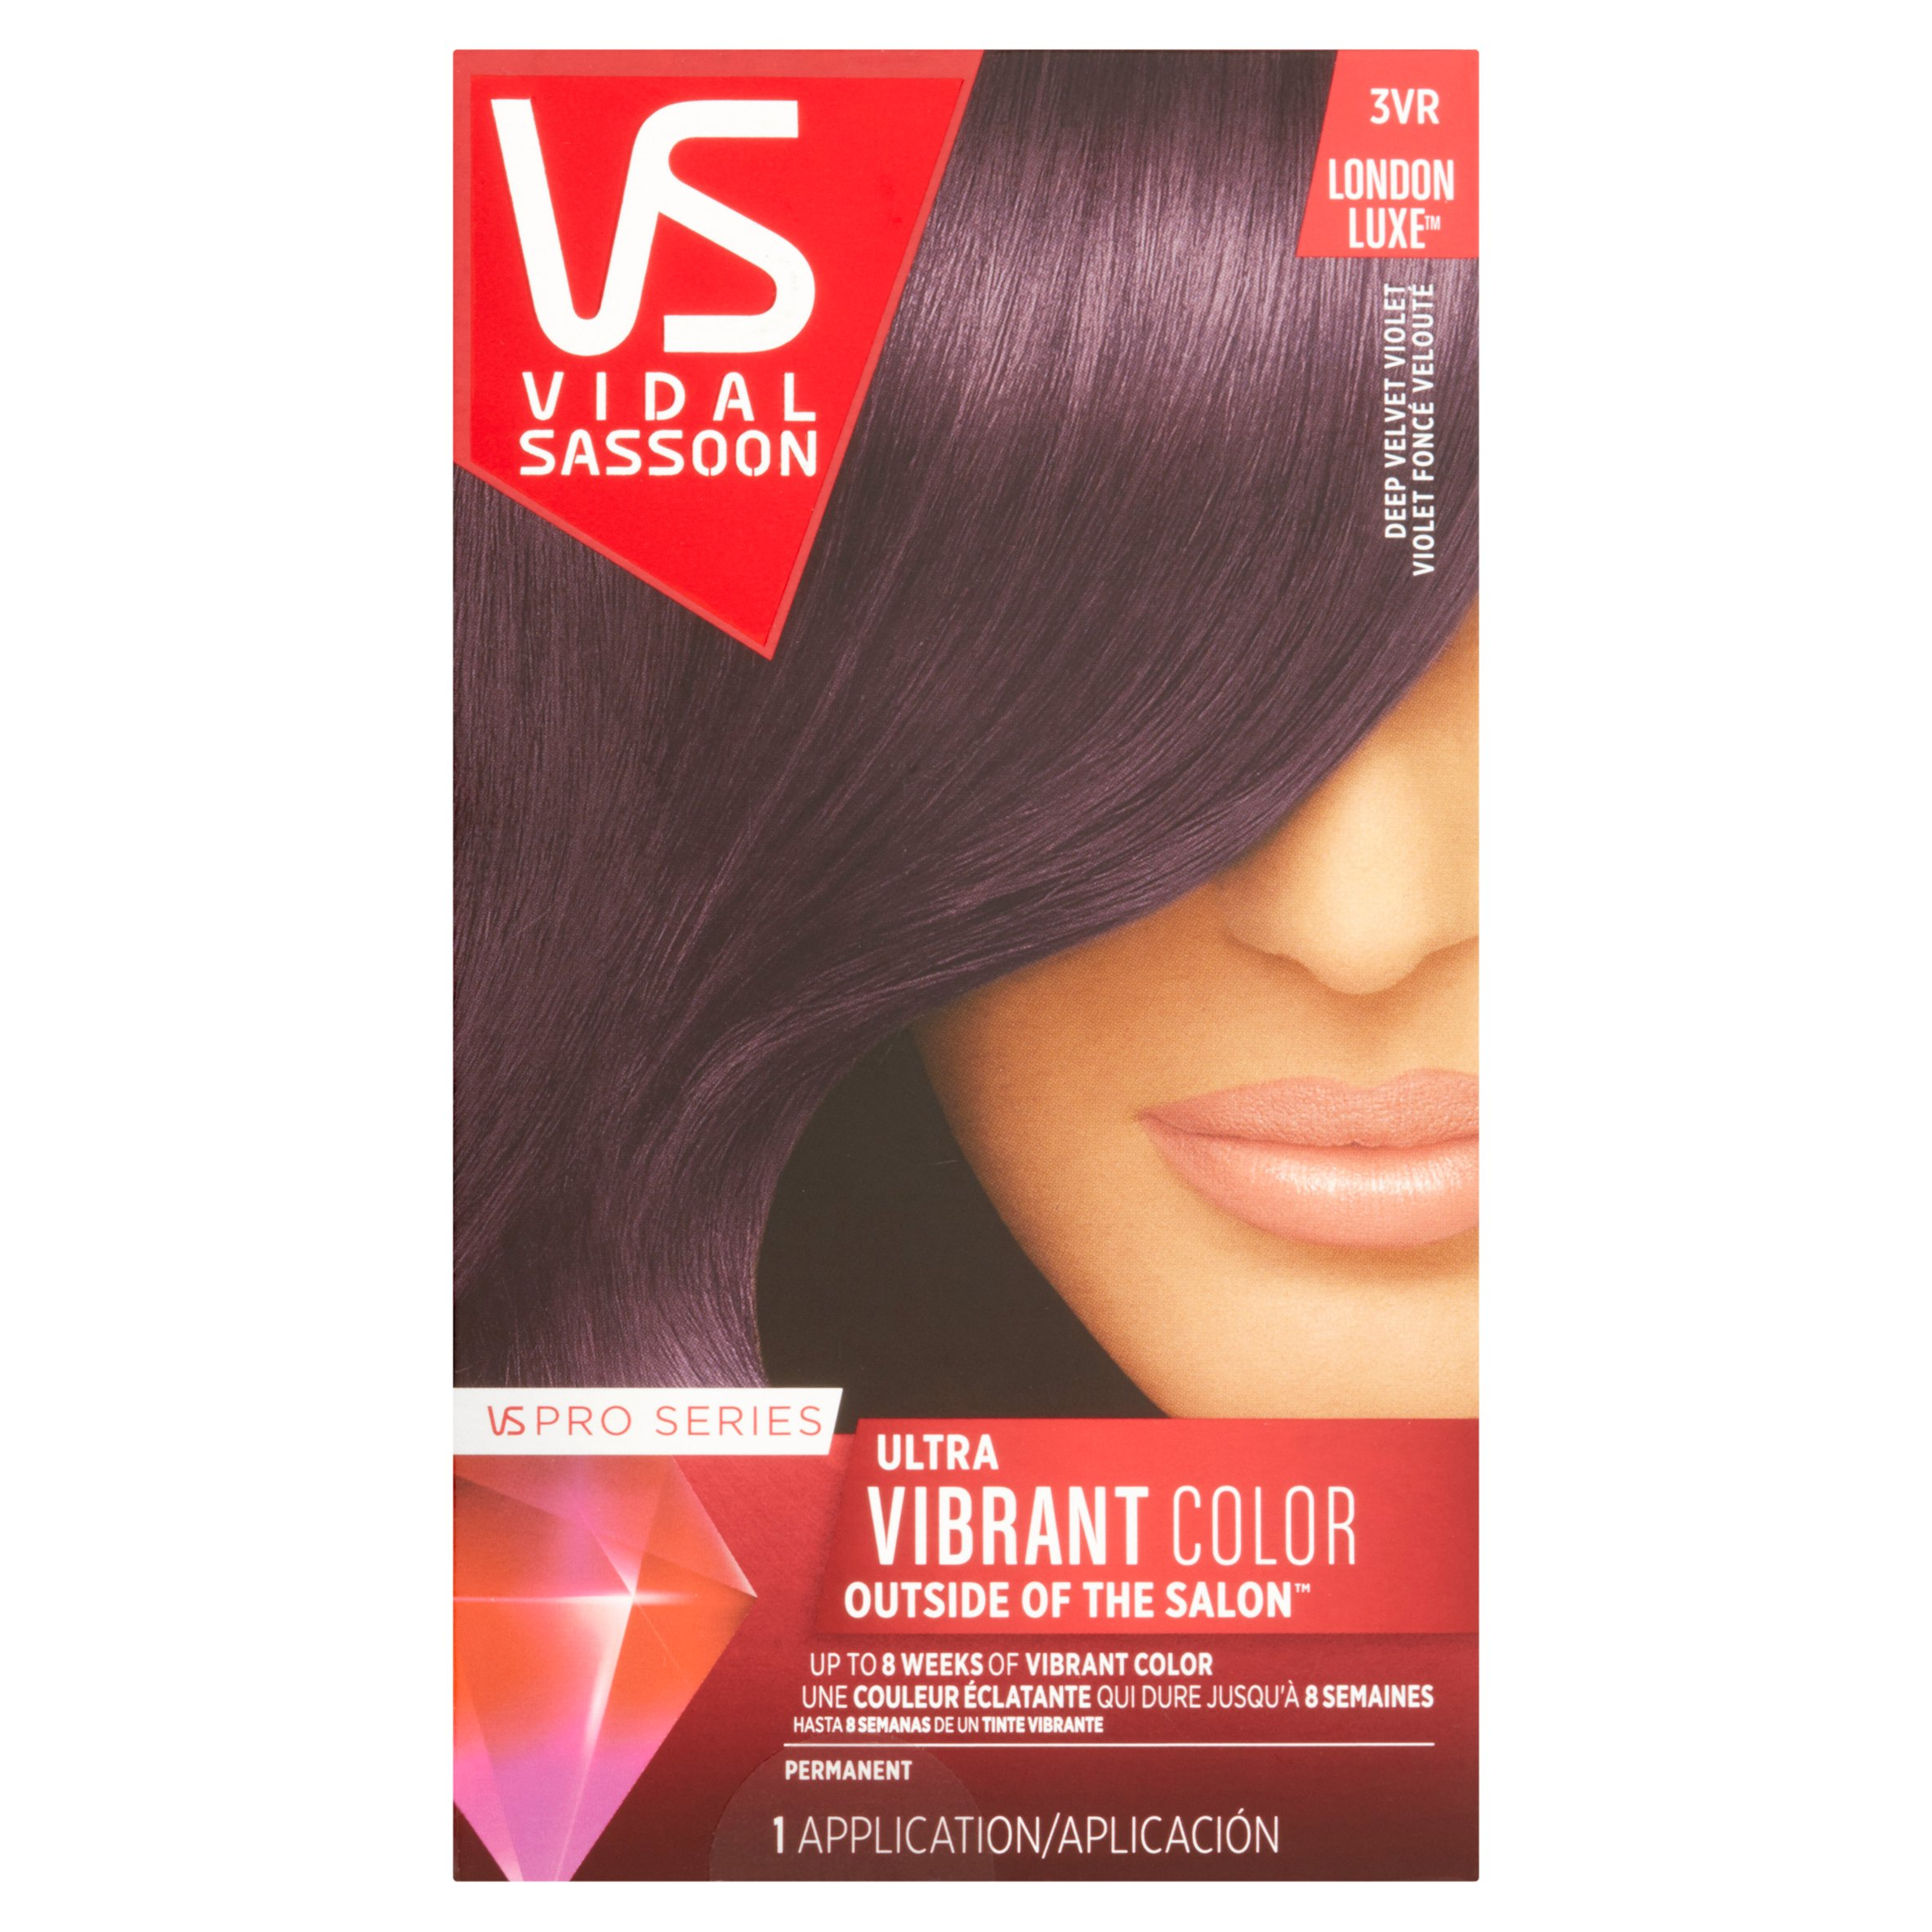 Vidal Sassoon Pro Series Ultra Vibrant Color 3VR Deep Velvet Violet Hair Color, 1 application